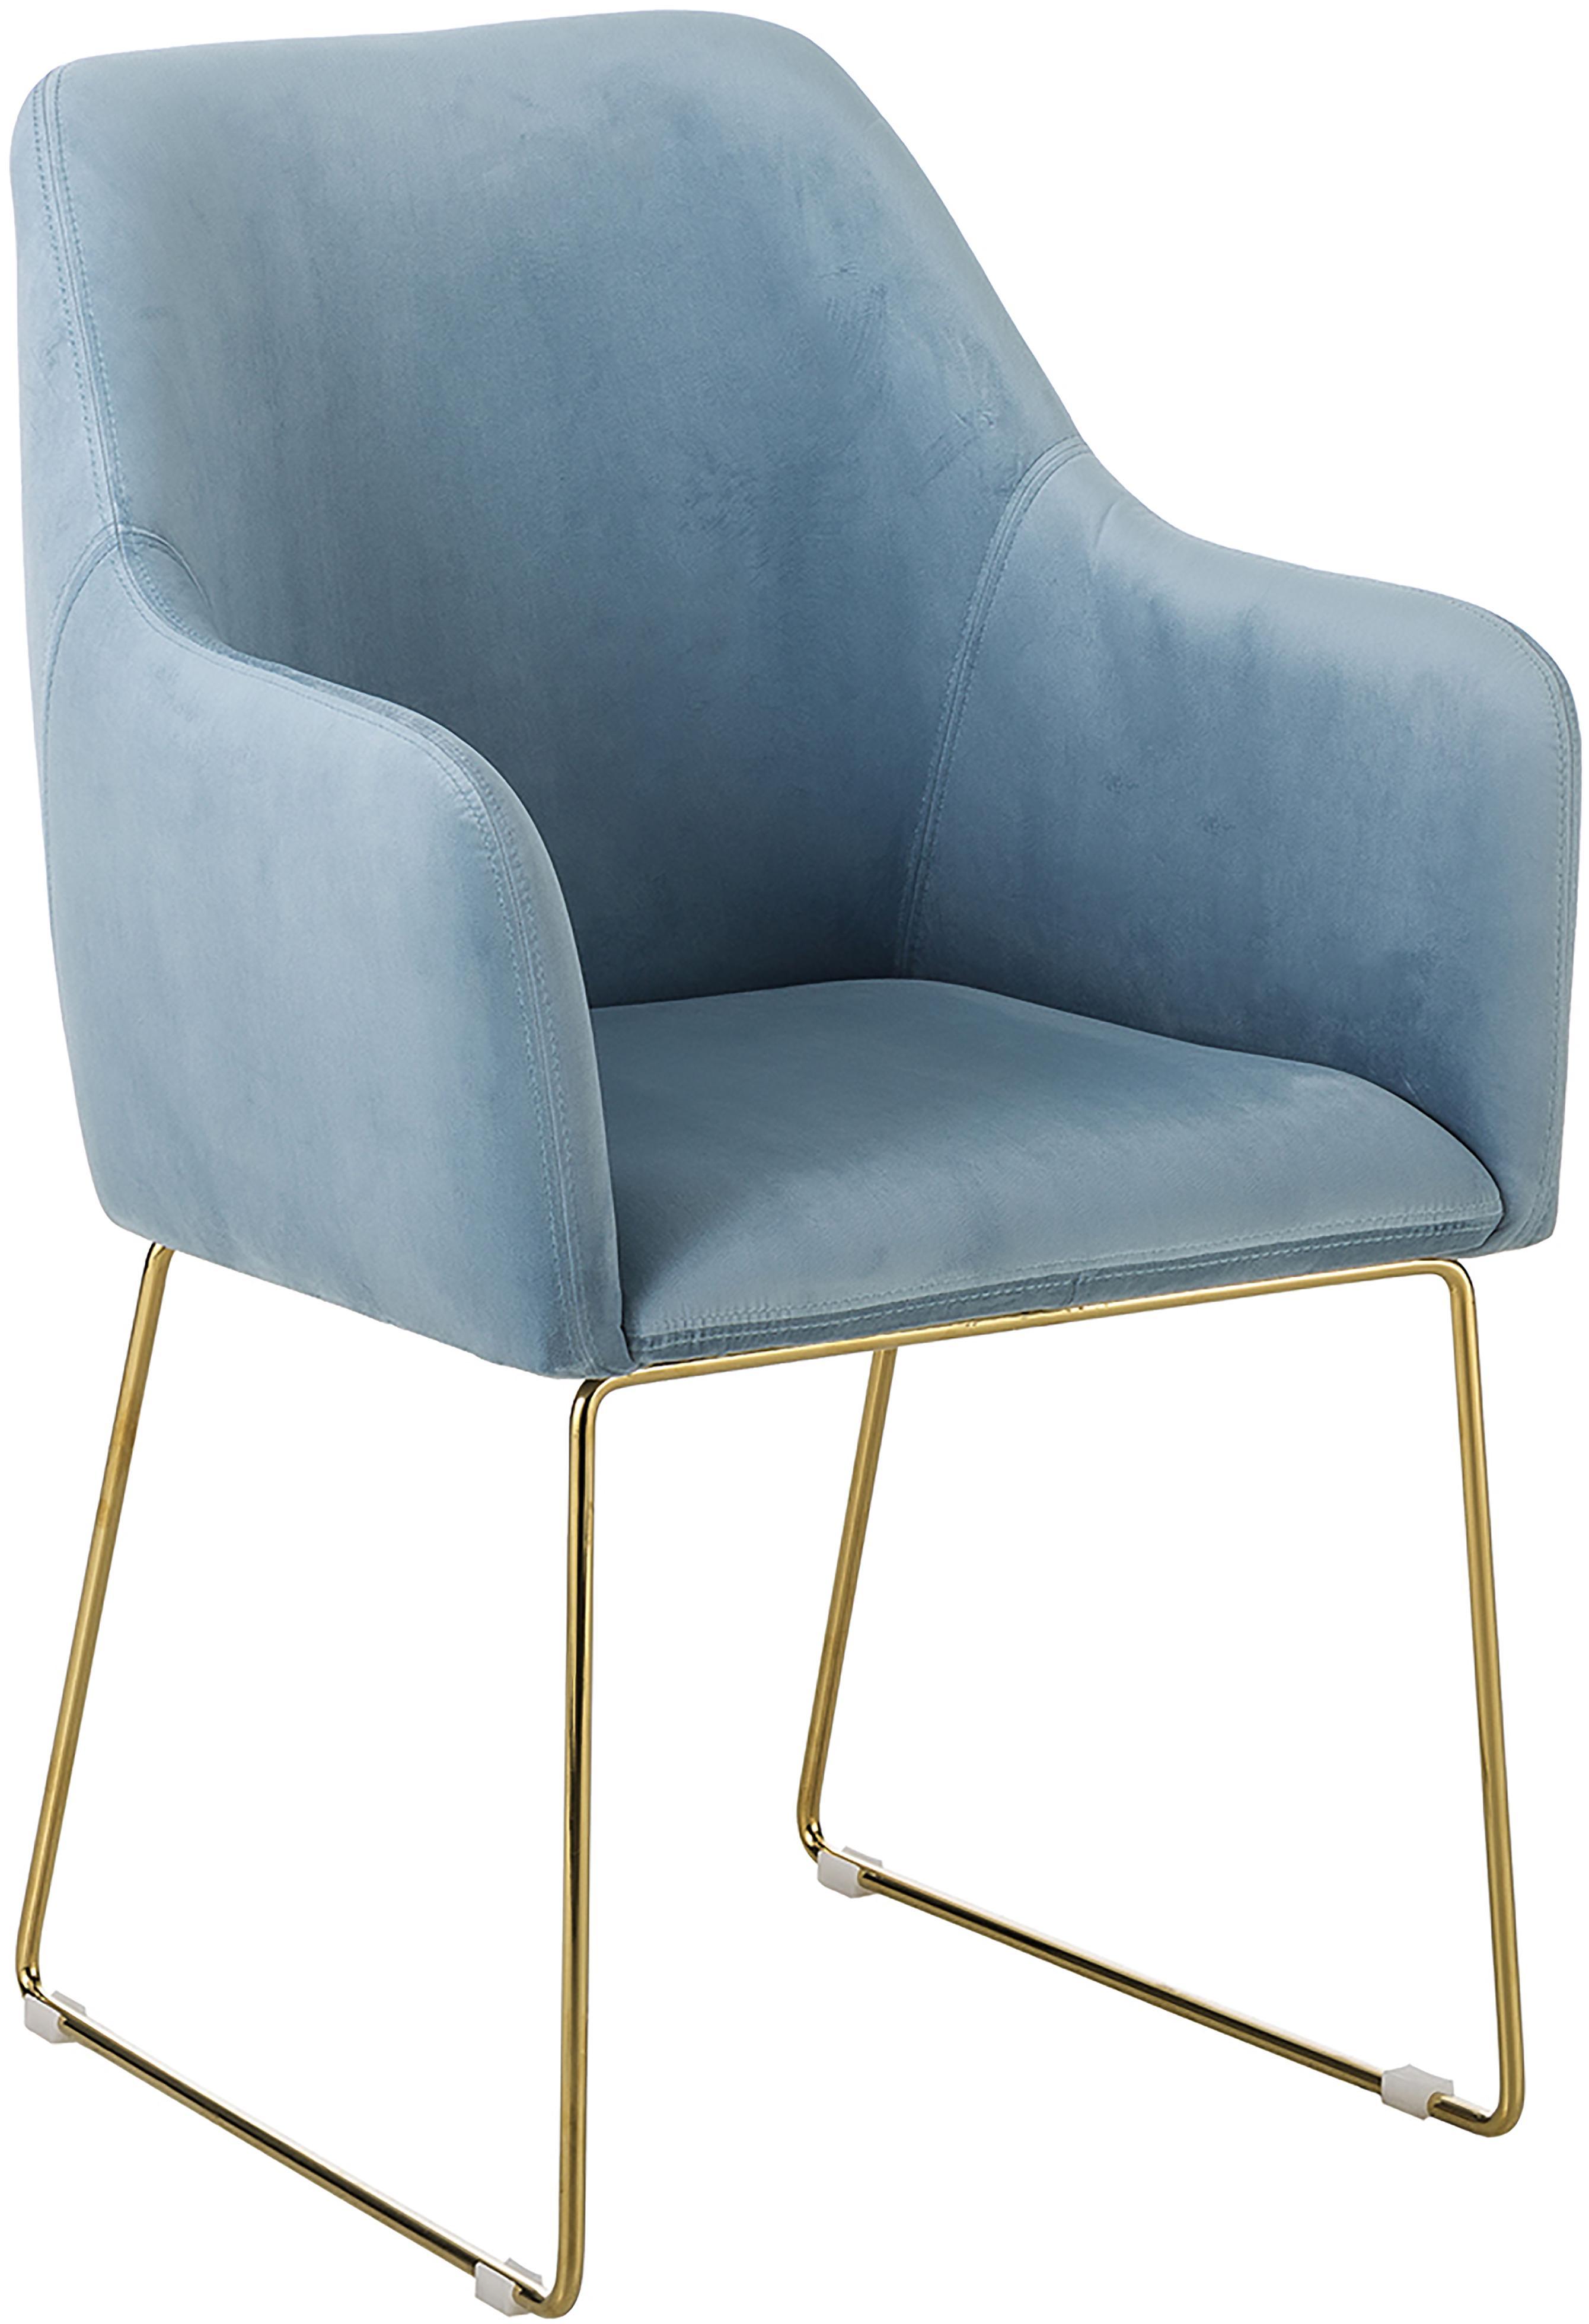 Moderne fluwelen armstoel Isla, Bekleding: fluweel (polyester), Poten: bekleed metaal, Lichtblauw, B 58 x D 62 cm